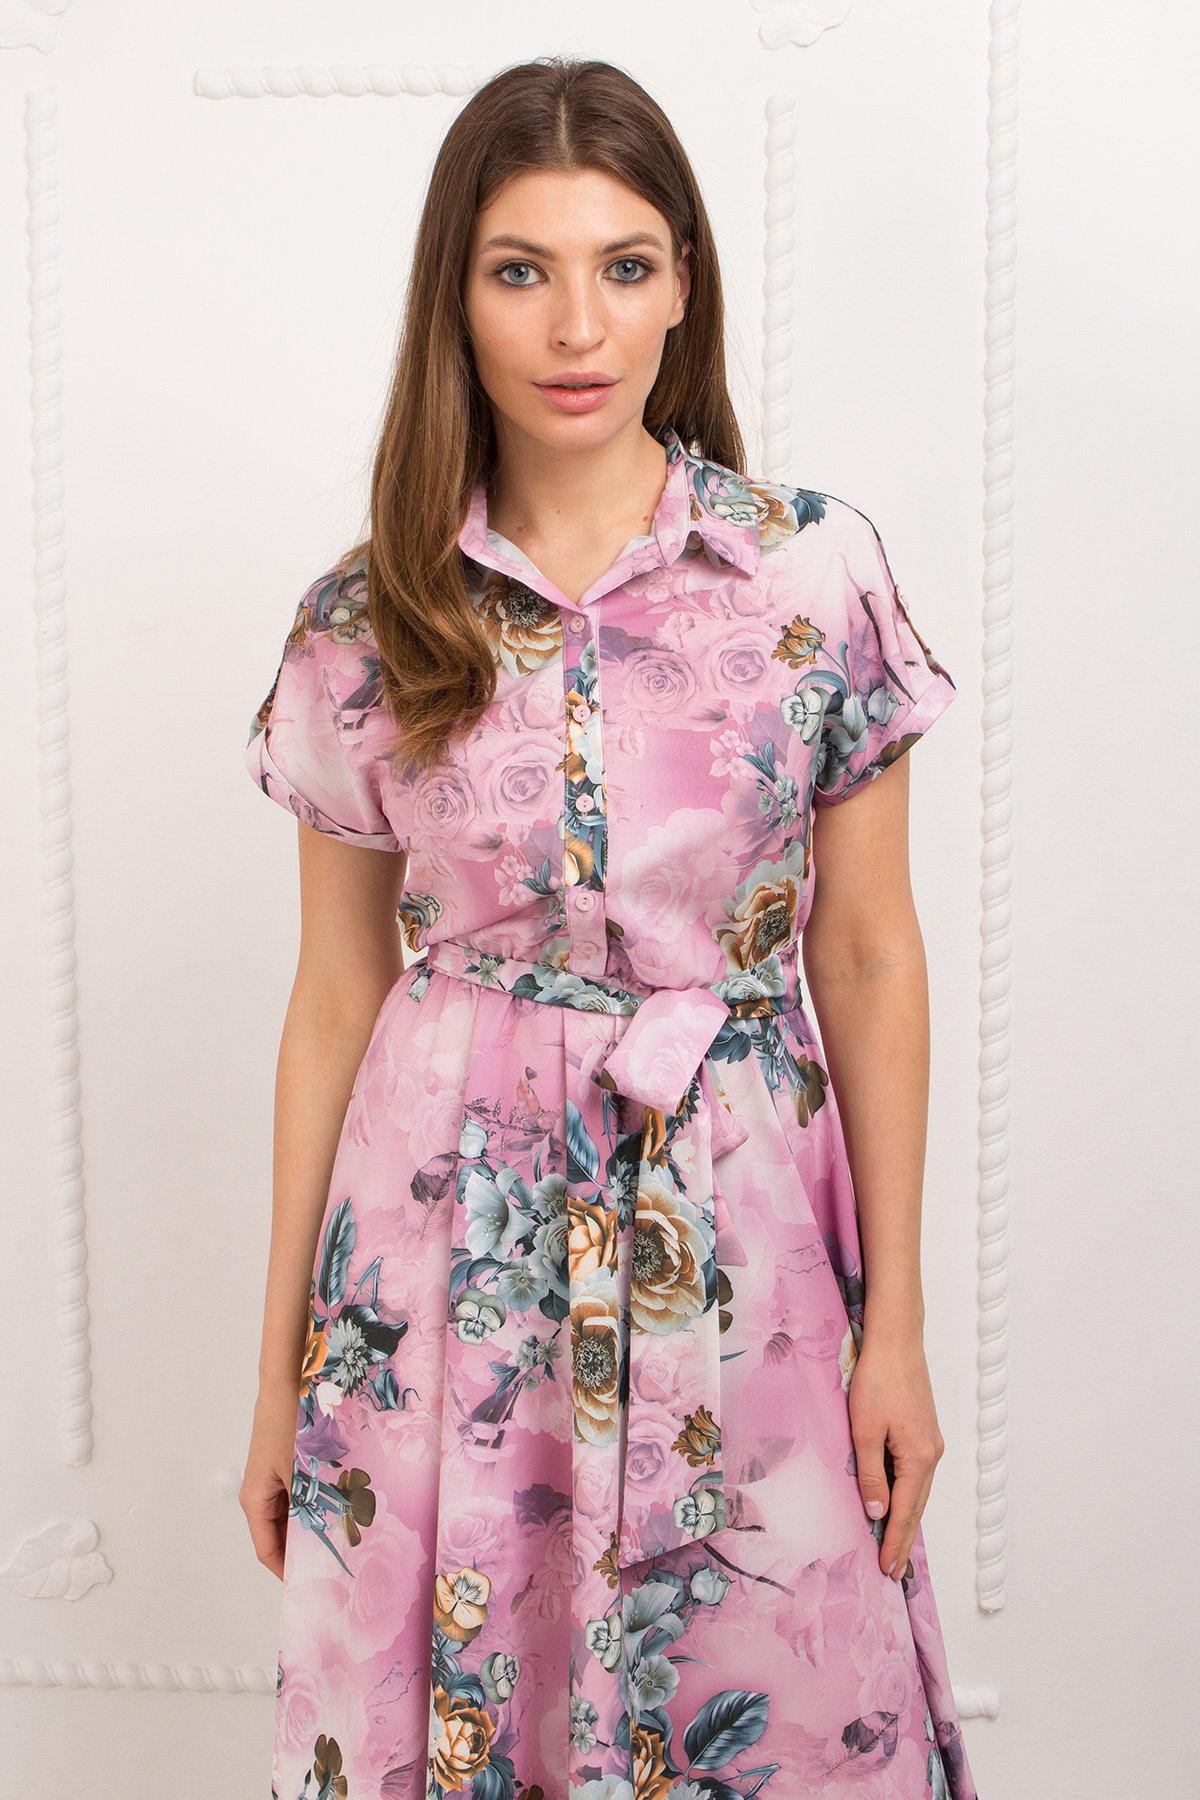 Платье Санжар 9090 АРТ. 45412 Цвет: цветы комби роз/мол/охра - фото 3, интернет магазин tm-modus.ru